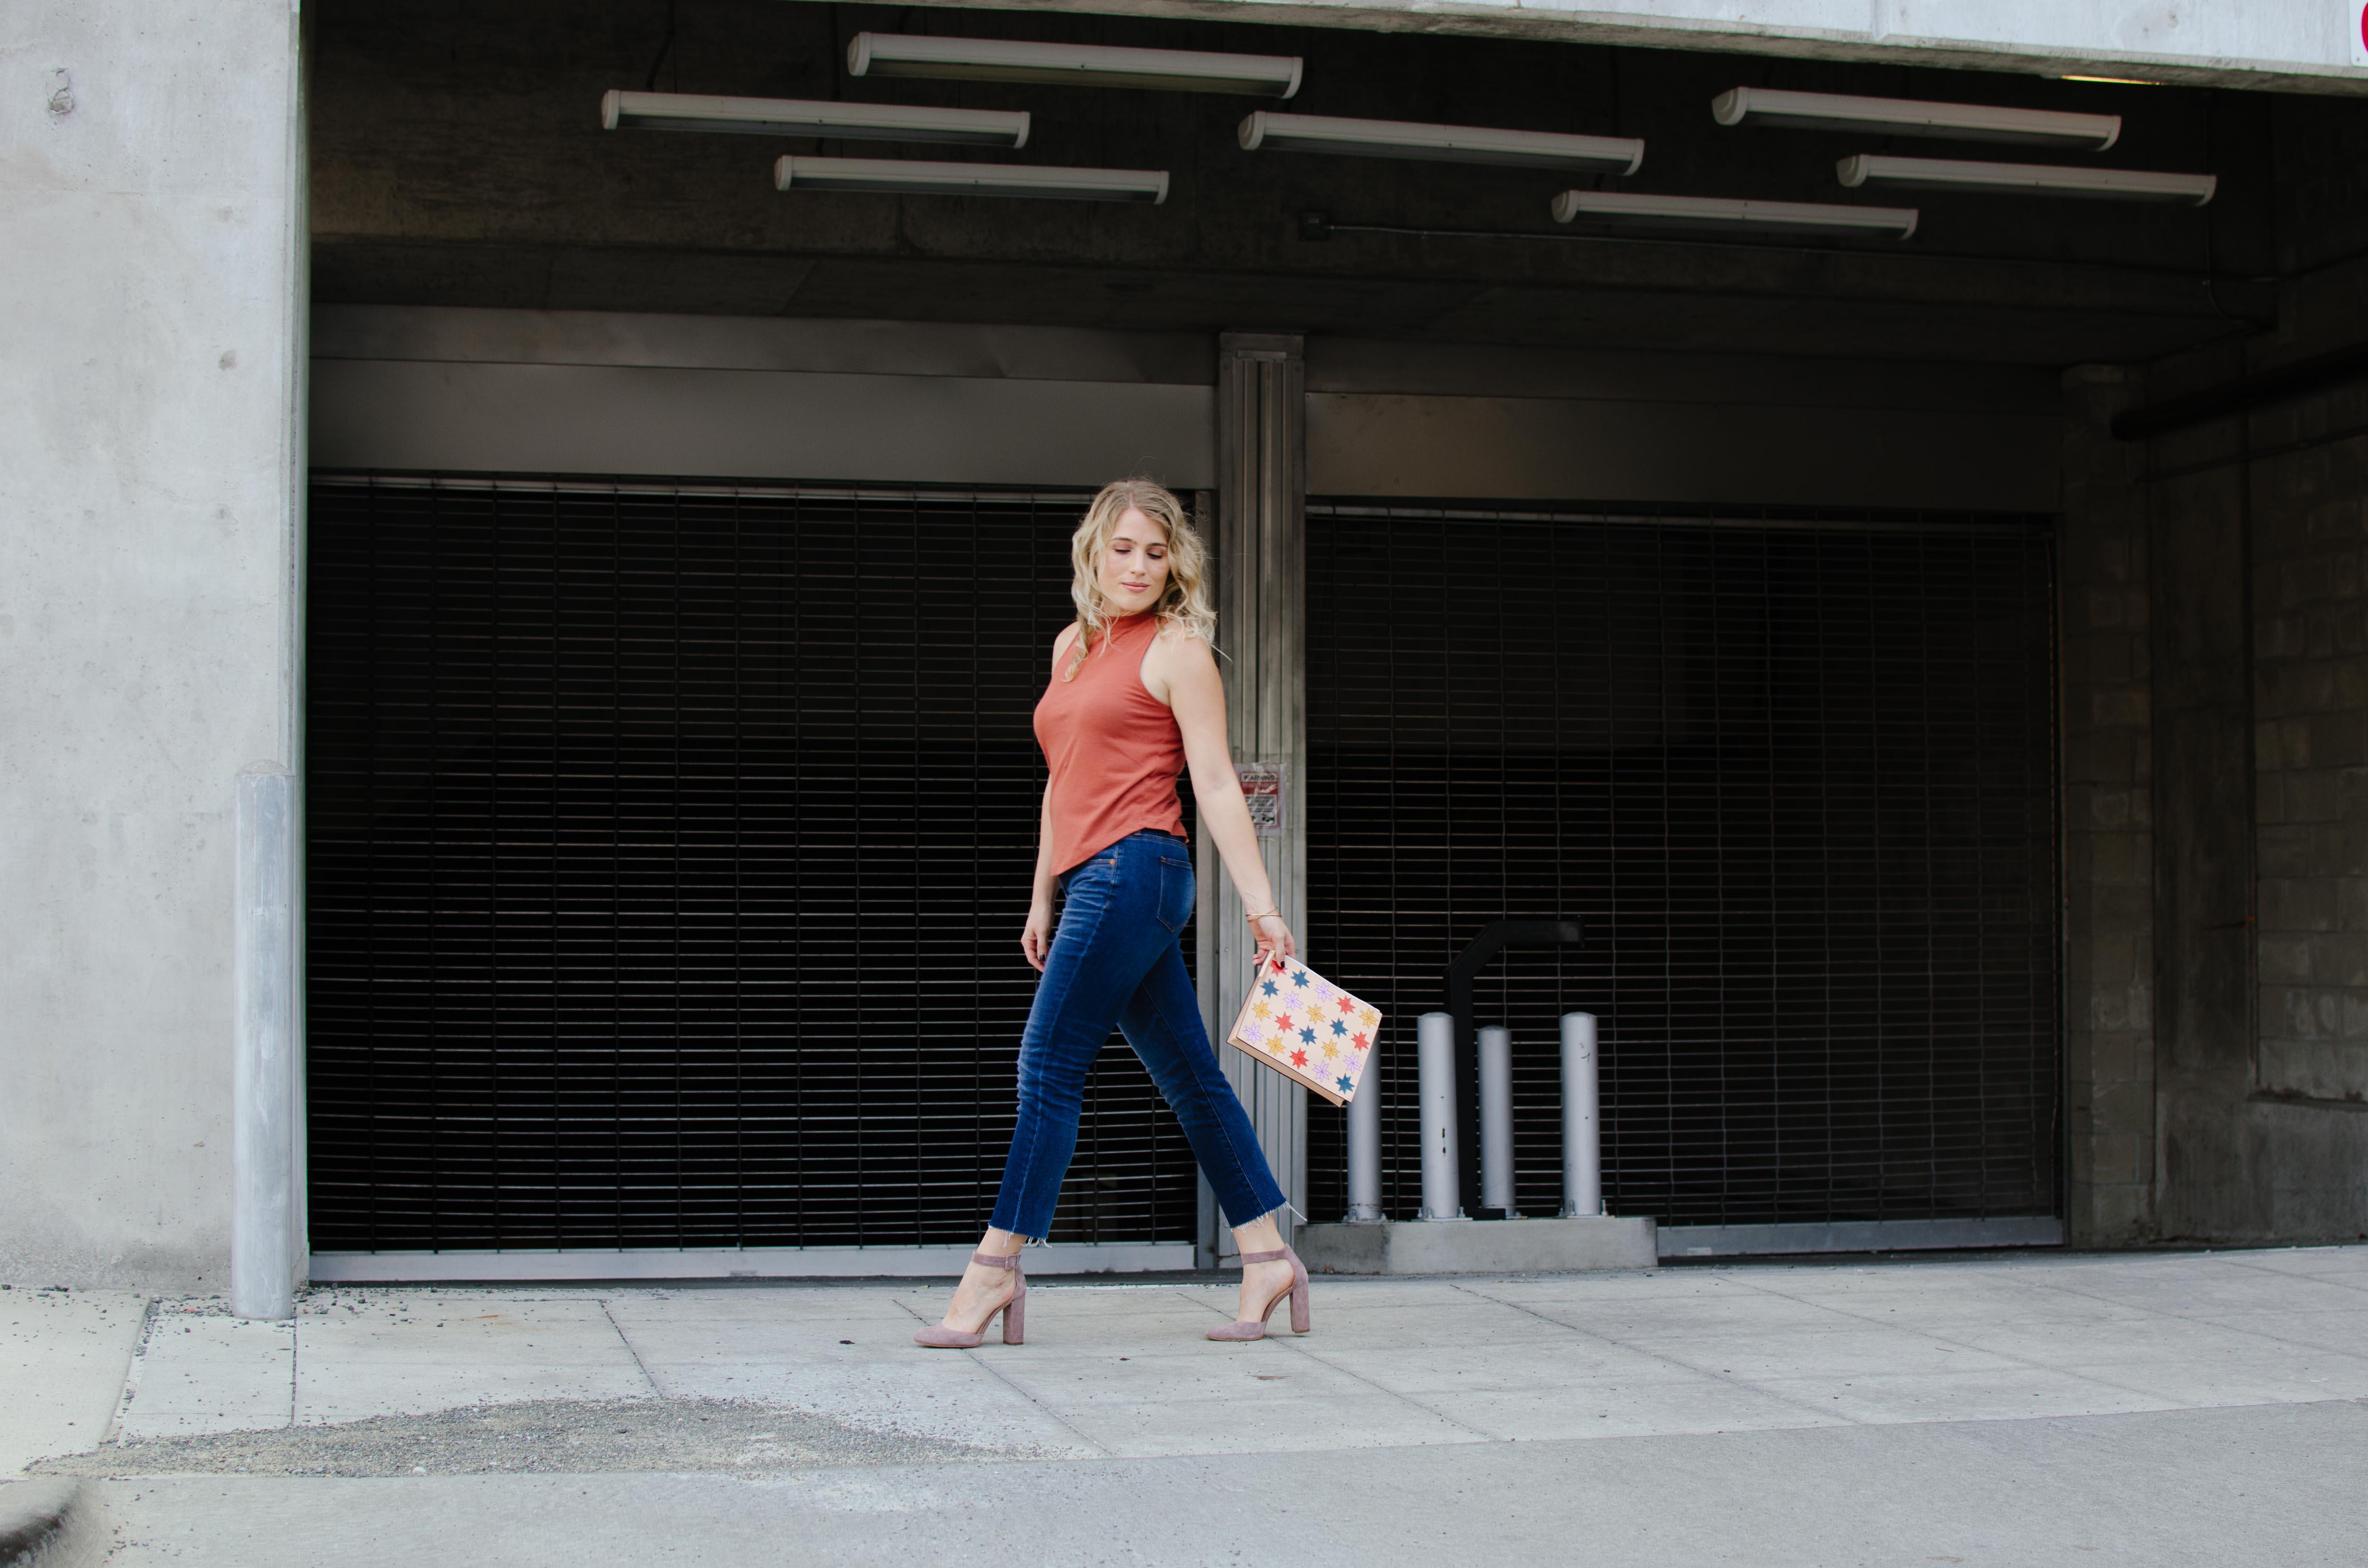 blondes-cant-wear-orange